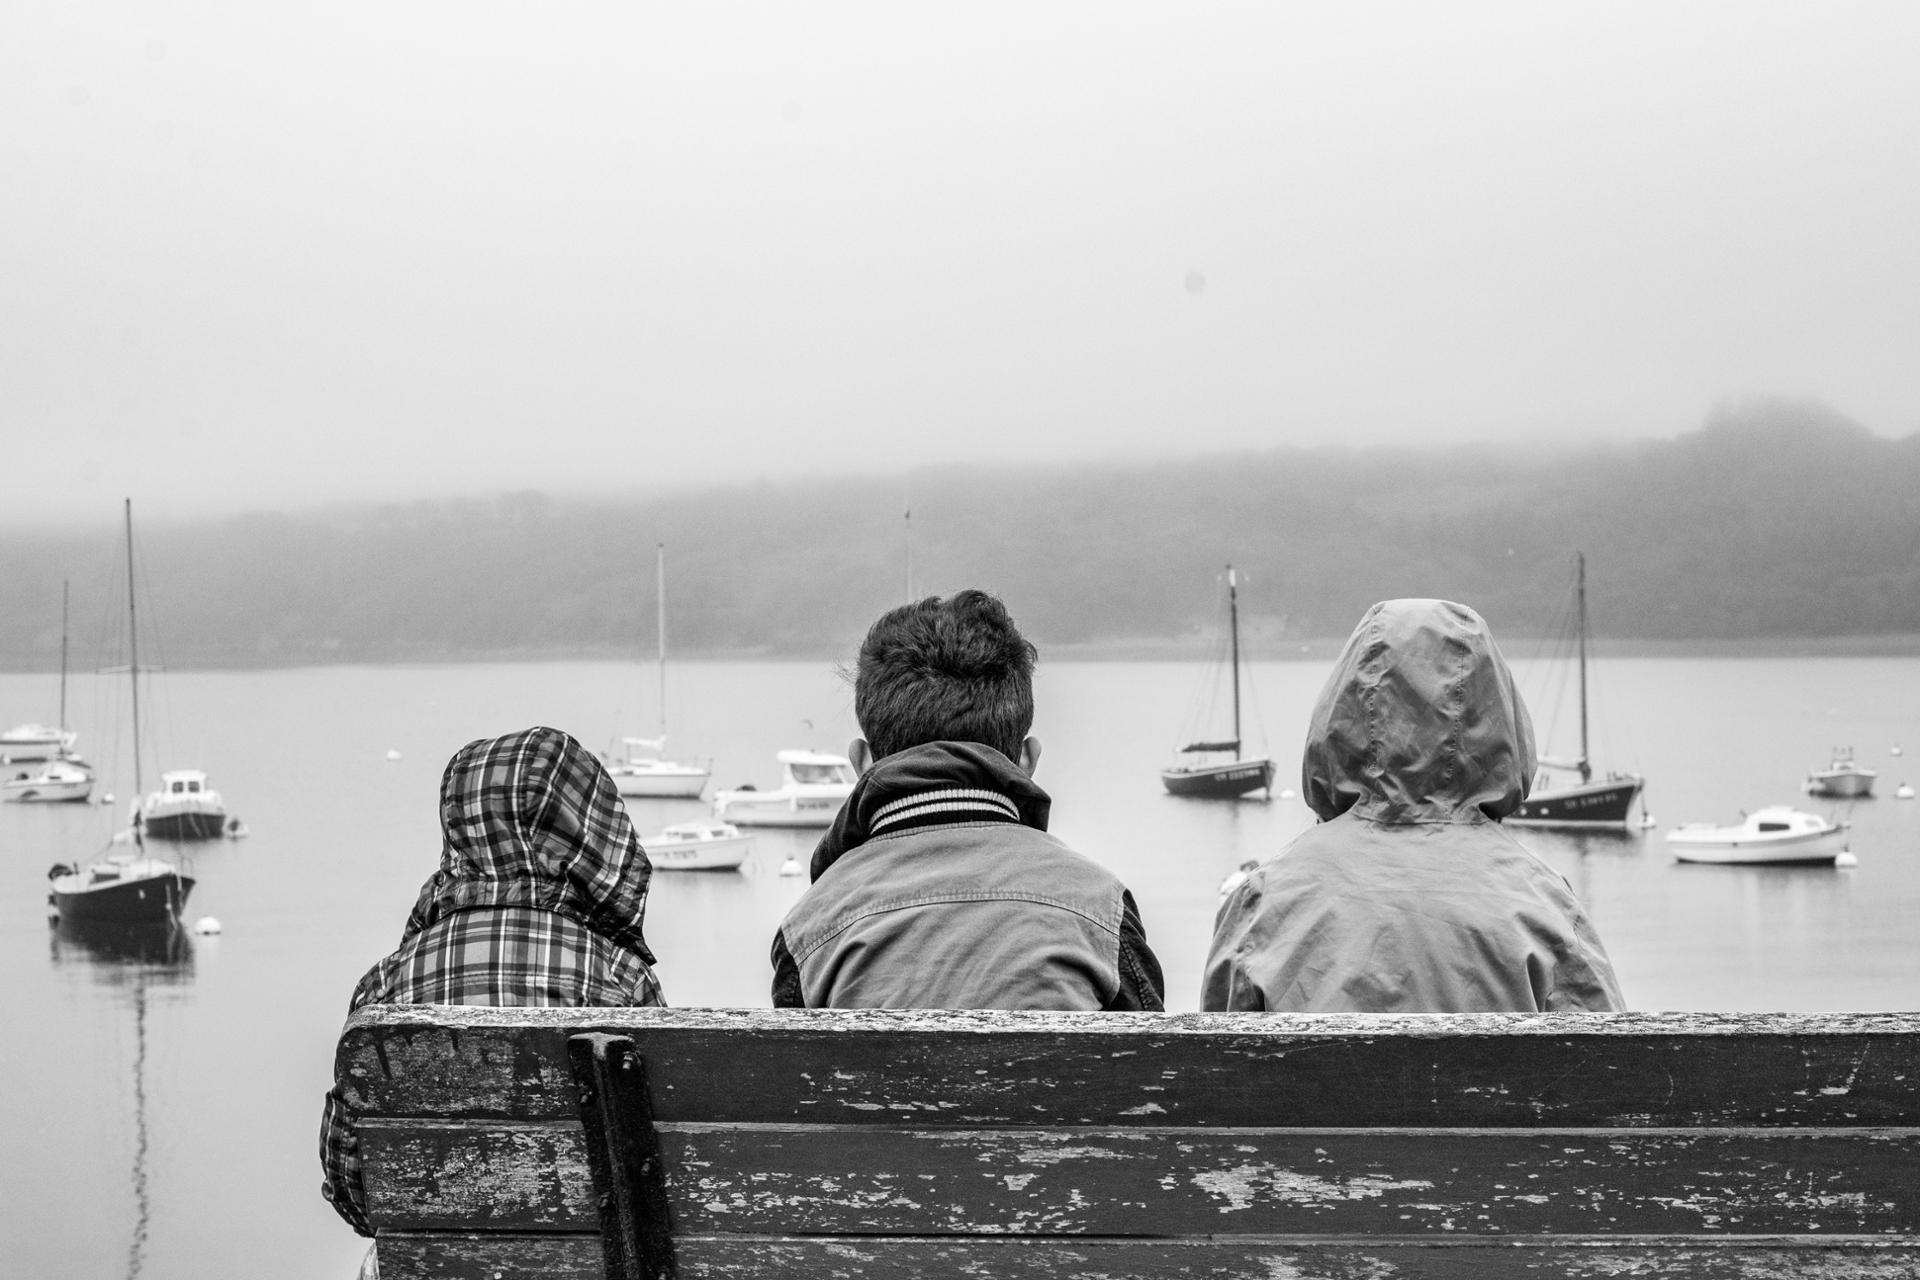 Regard sur mer